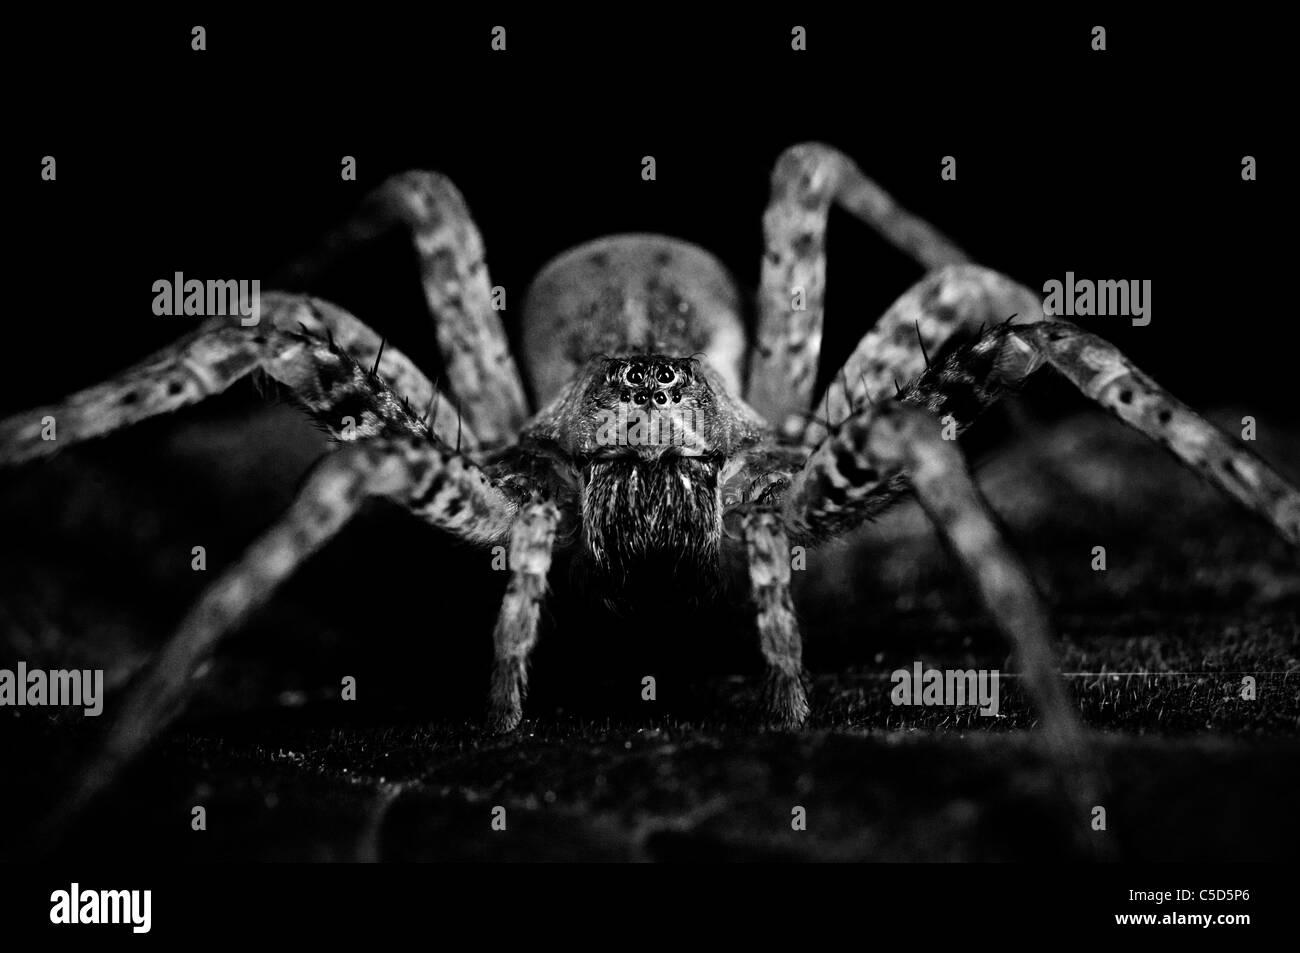 Spider portrait - Stock Image